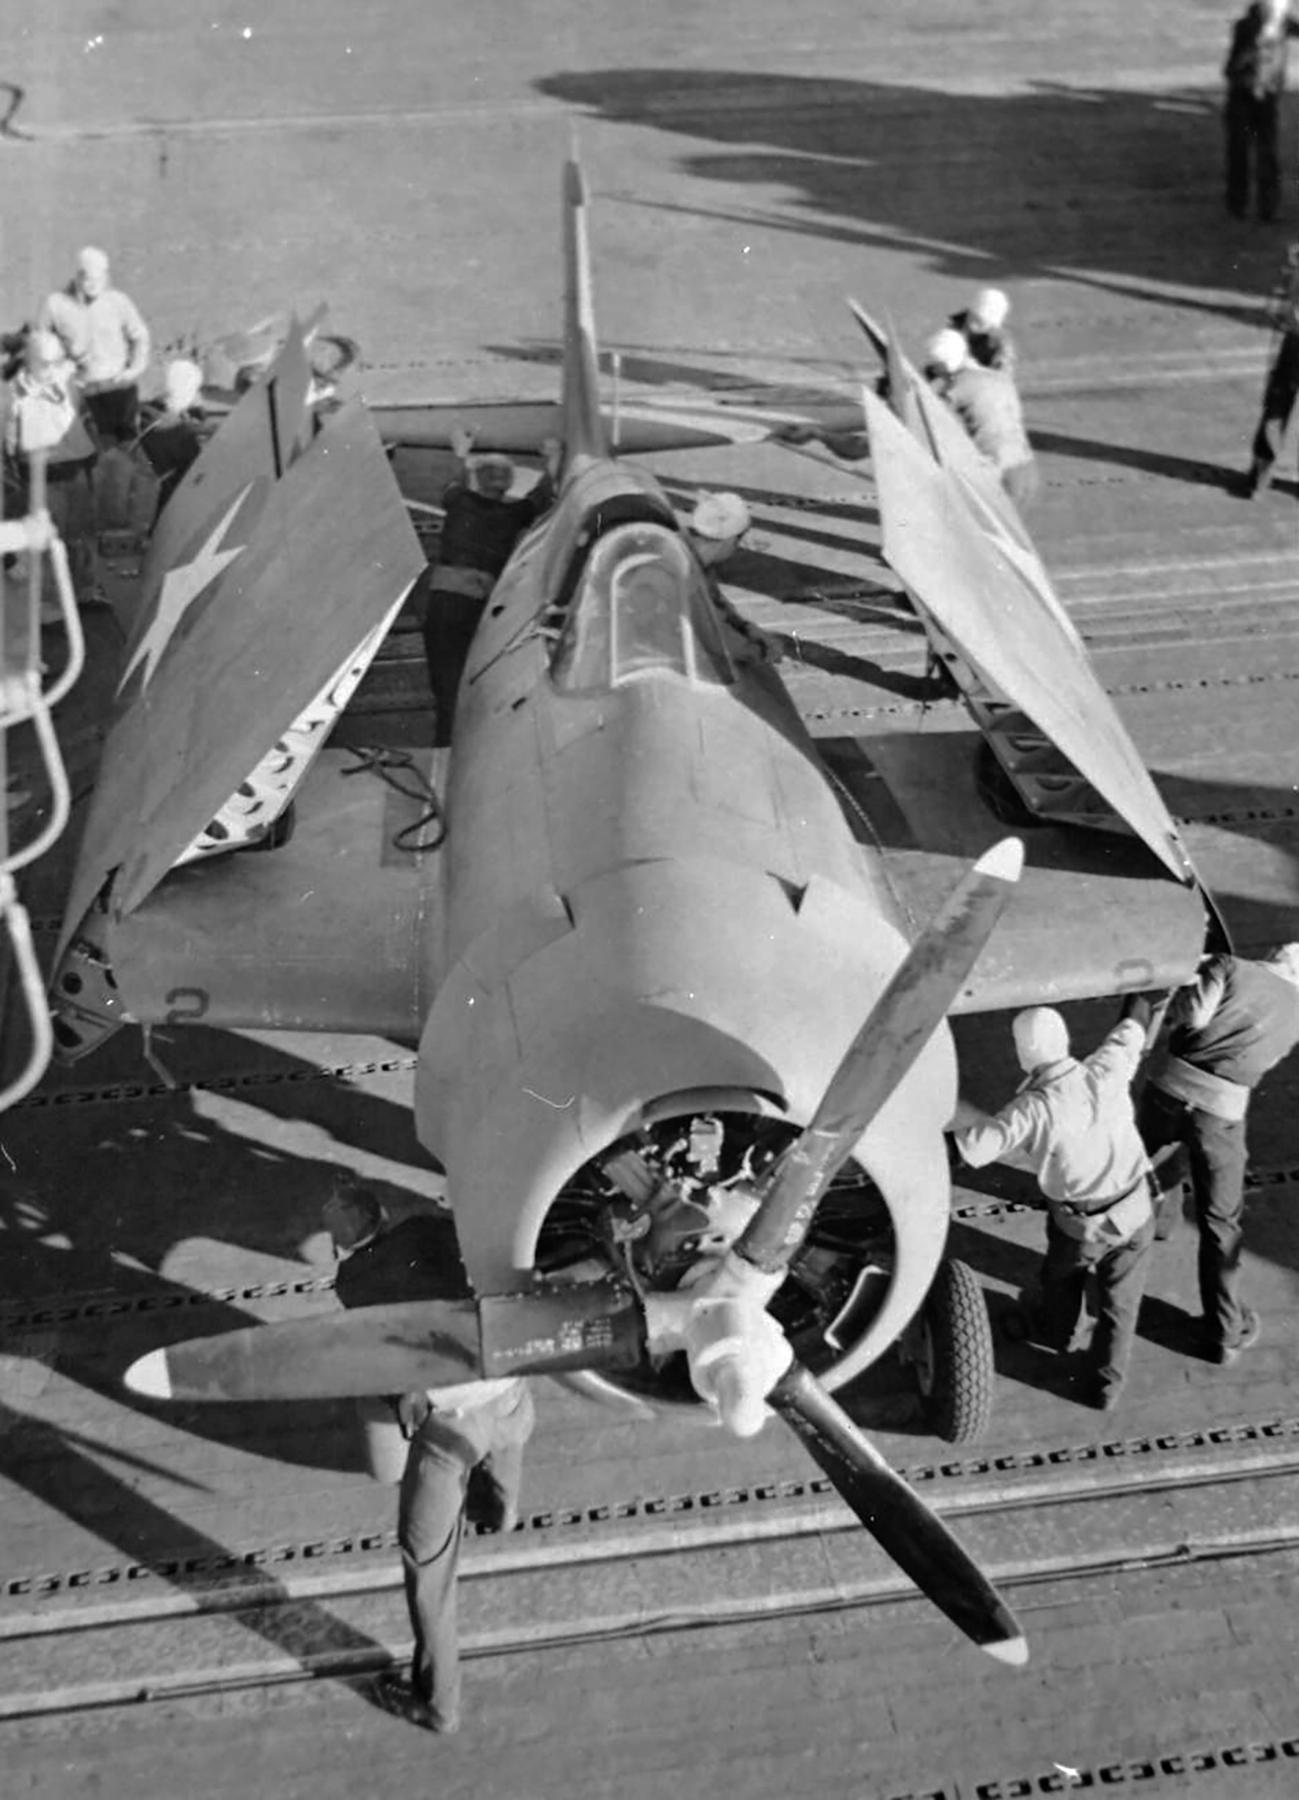 Grumman F4F 4 Wildcat VF 9 Black 9F2 CV 4 USS Ranger Oct 1942 01